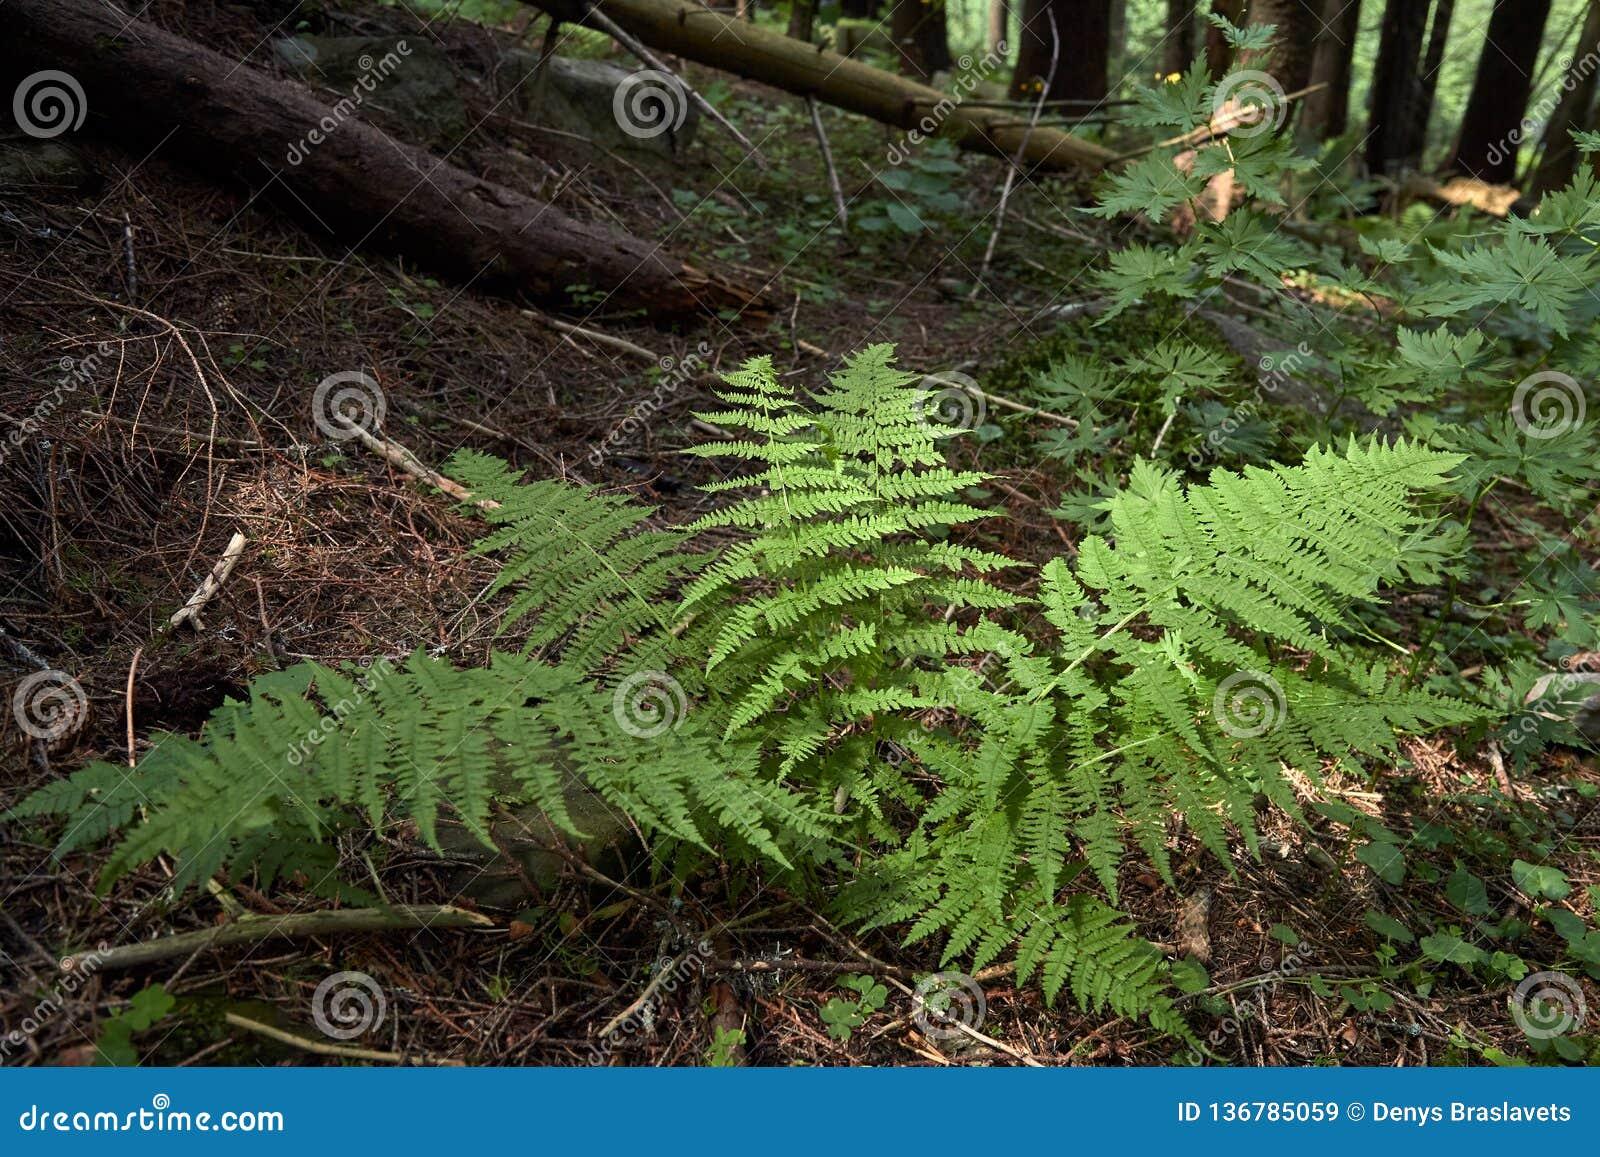 Green bush fern in the forest in summer